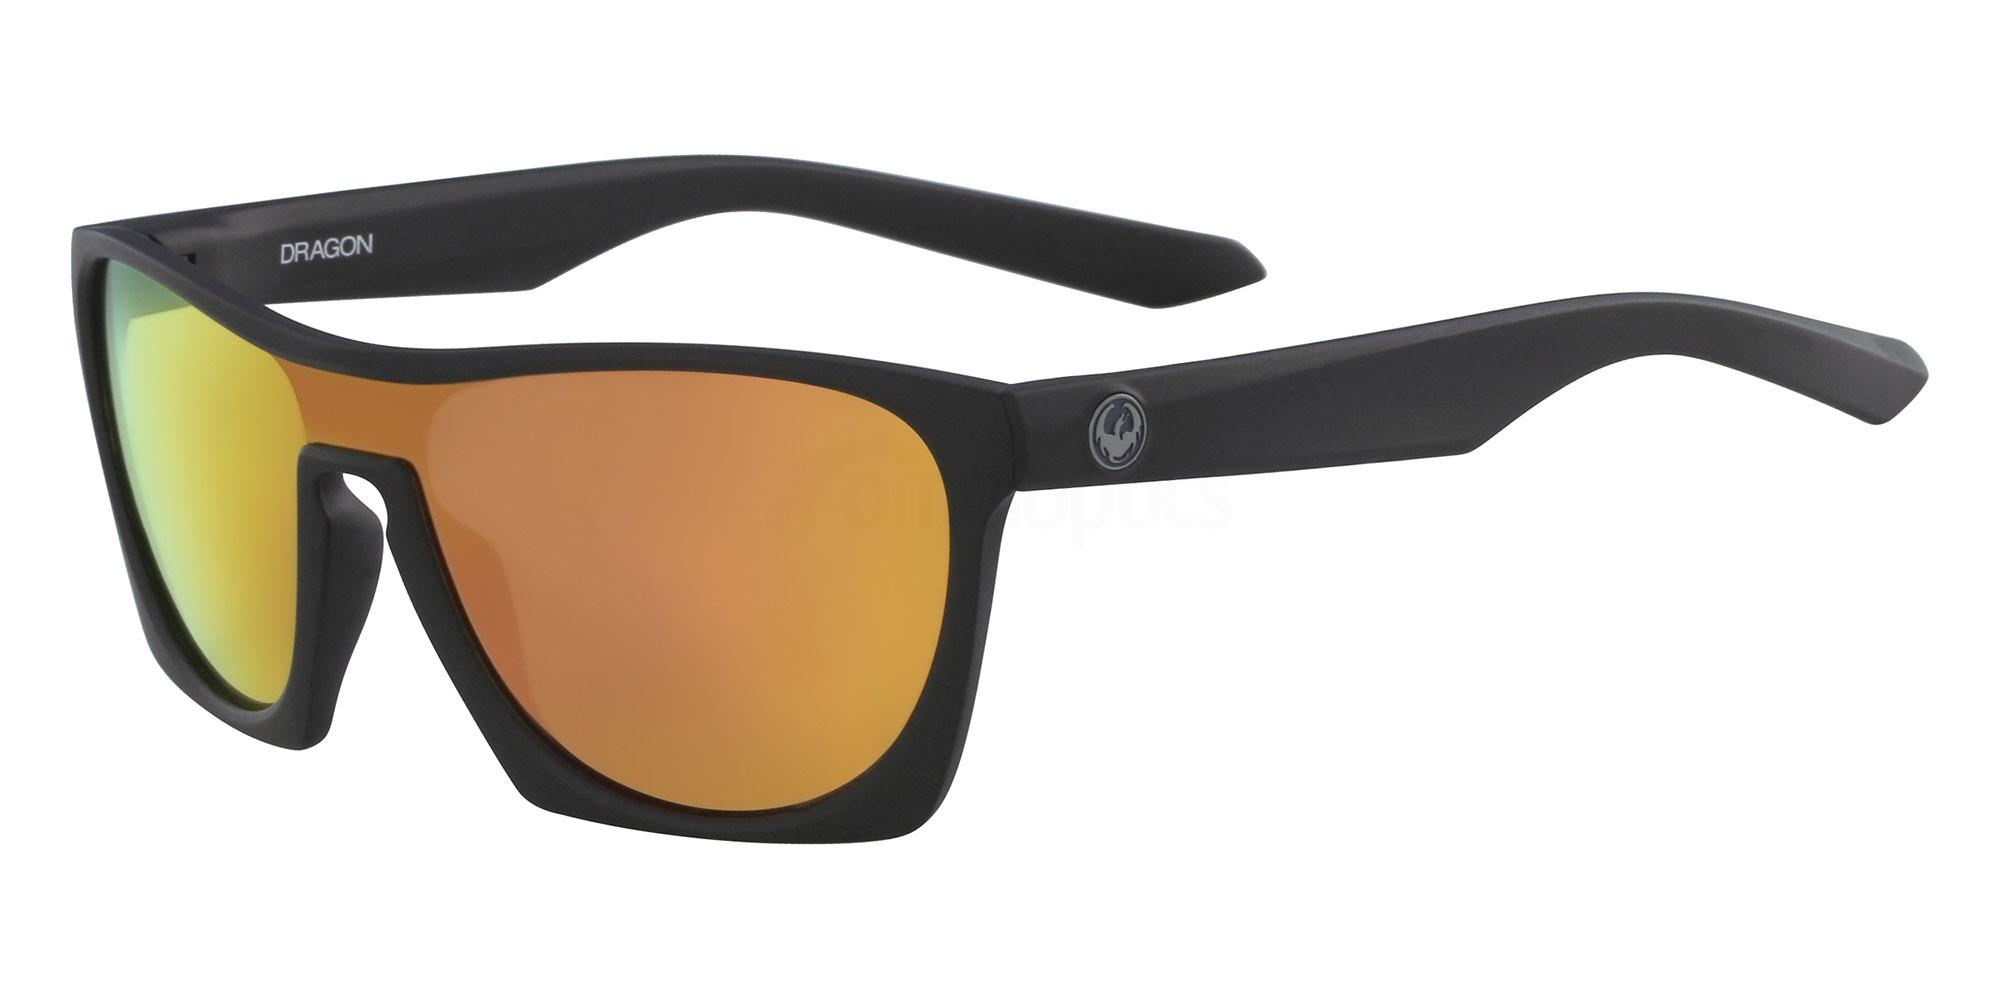 005 DR CLASSY ION Sunglasses, Dragon